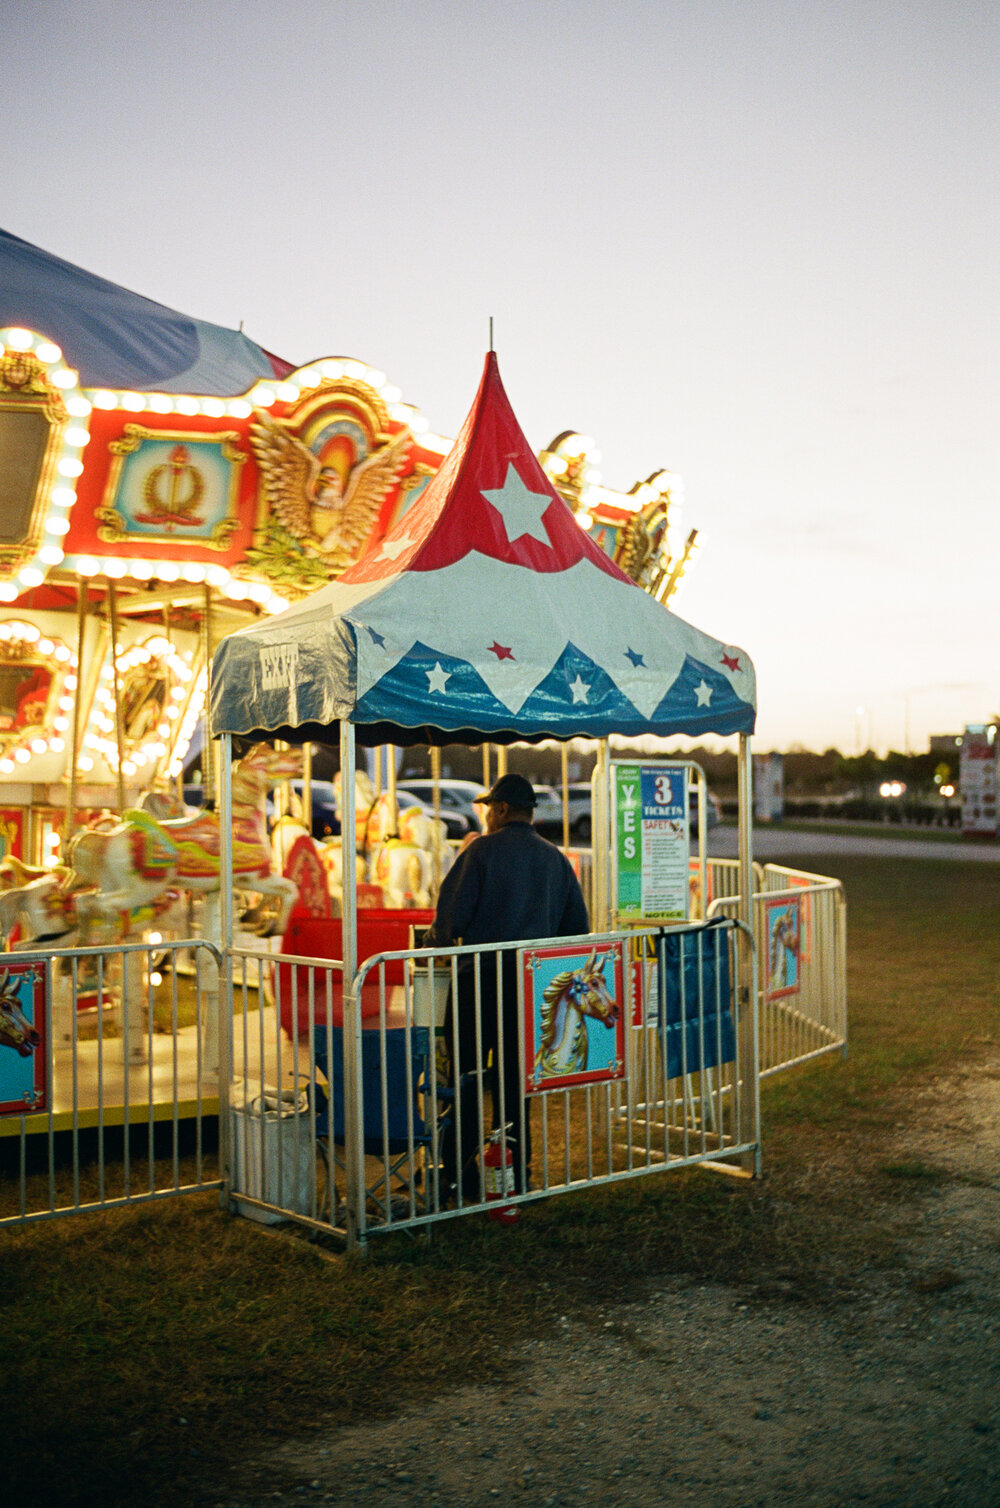 25-Sarasota-Carnival-Leica-M6-48.jpg